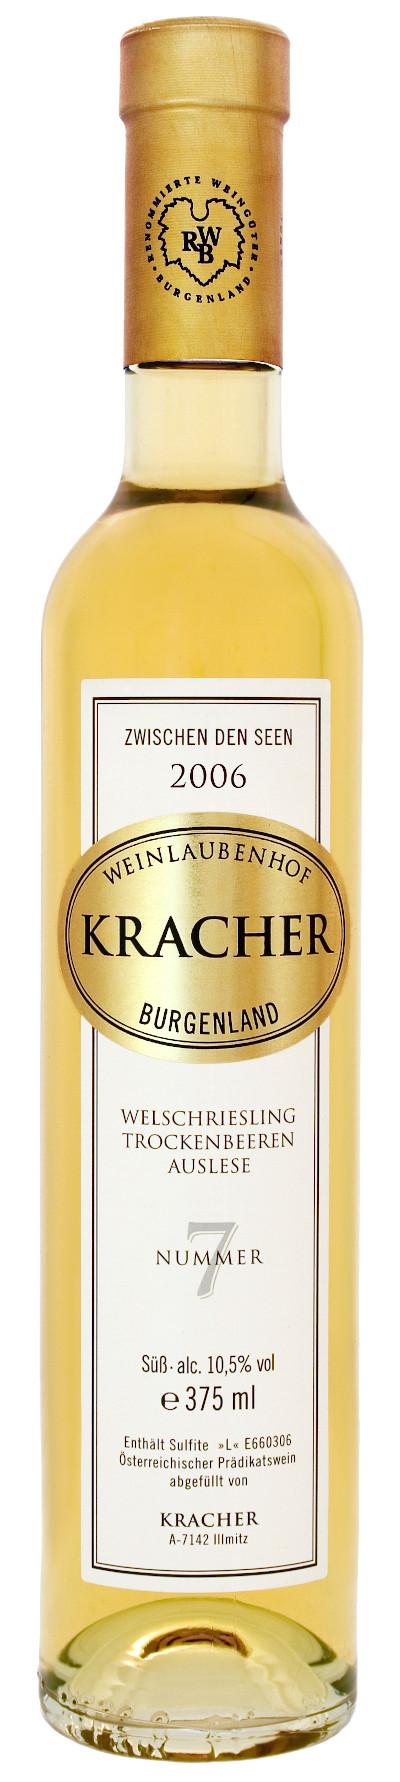 Kracher - Rarität Welschriesling Trockenbeerenauslese Nr. 7 Zwischen den Seen